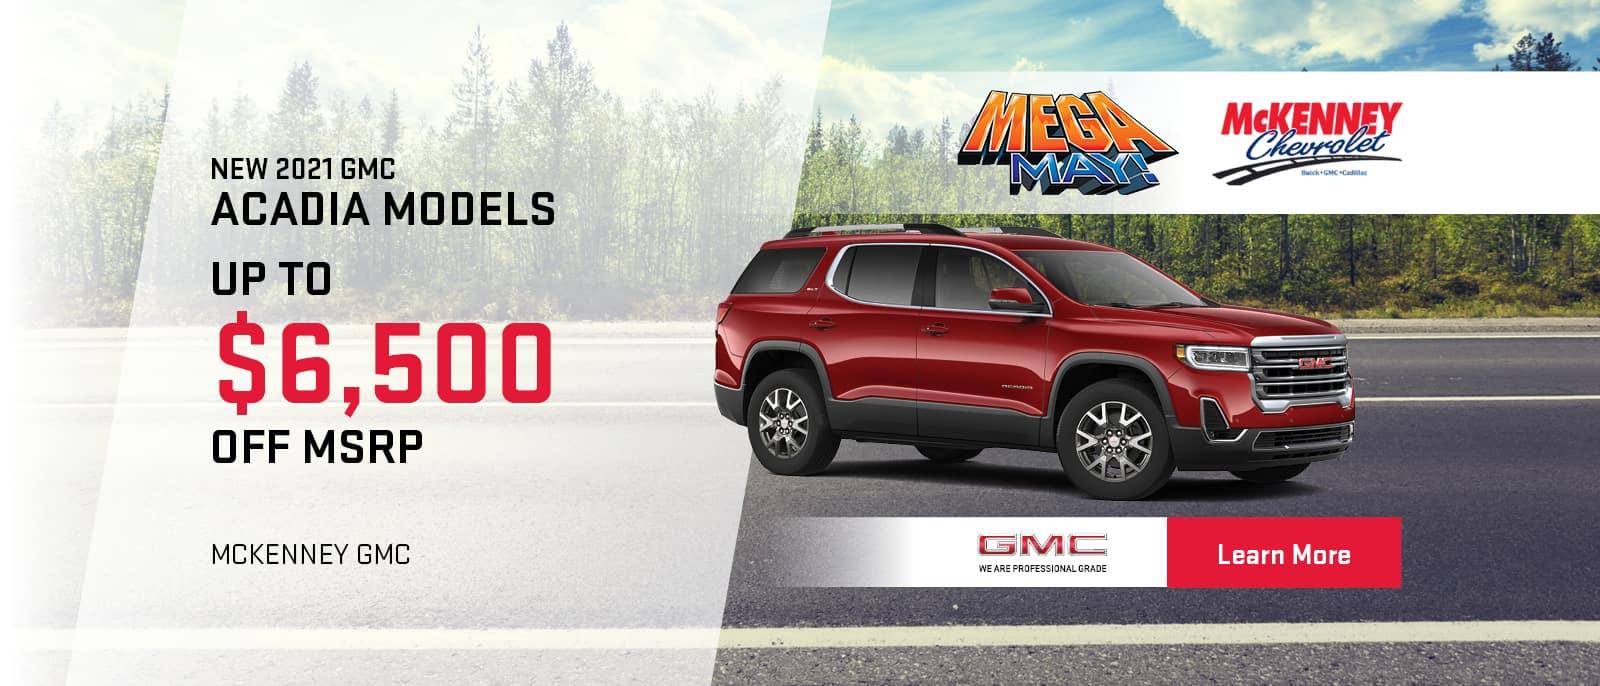 2021 GMC Acadia Models